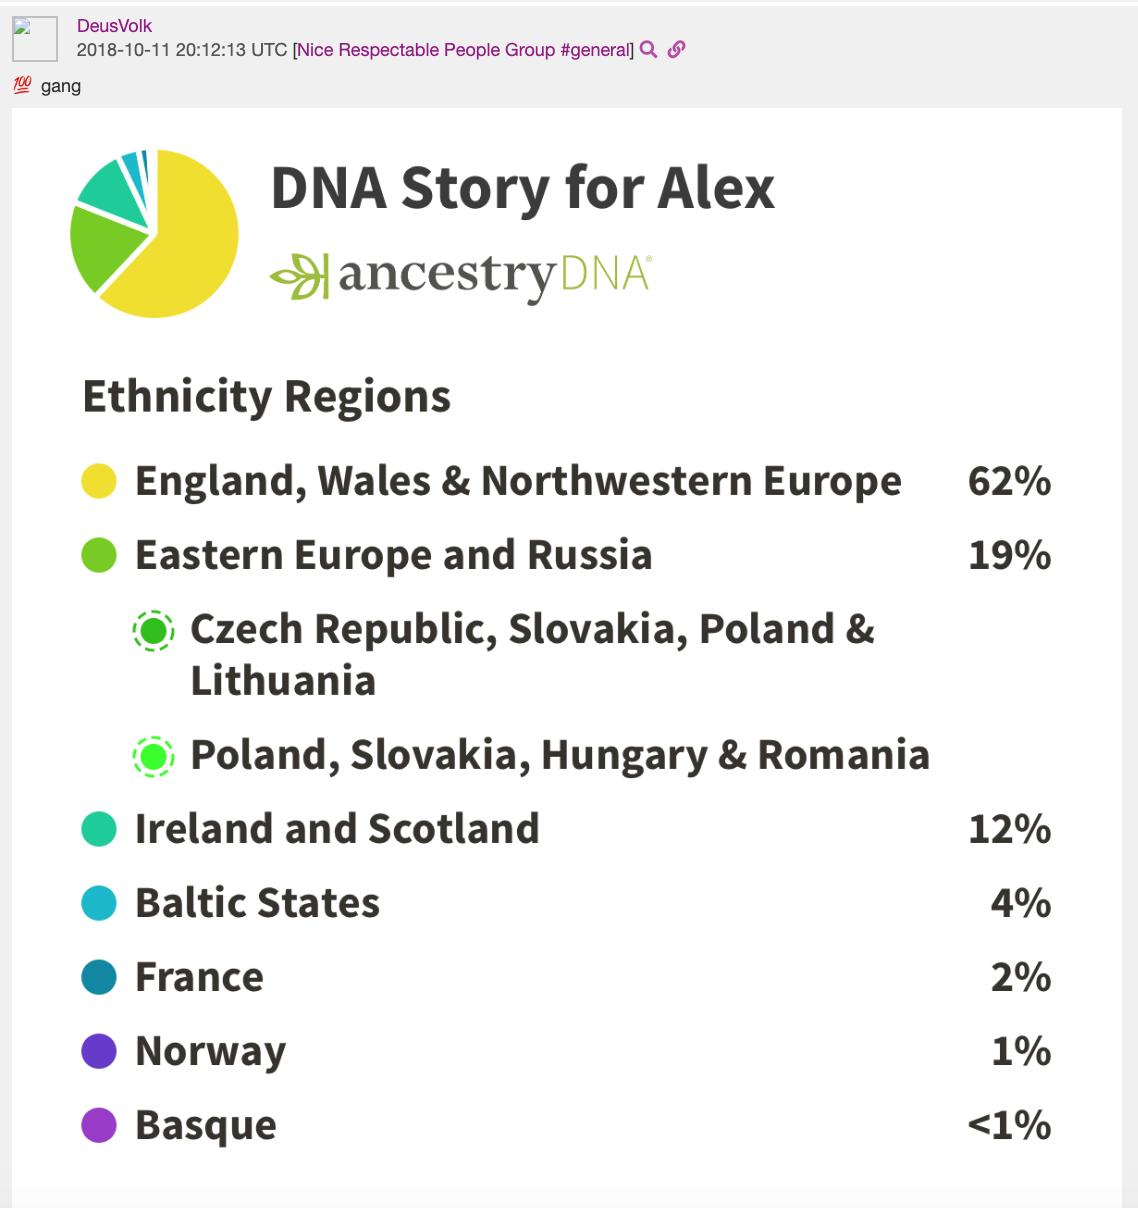 DeusVolk shares AncestryDNA results for an Alex